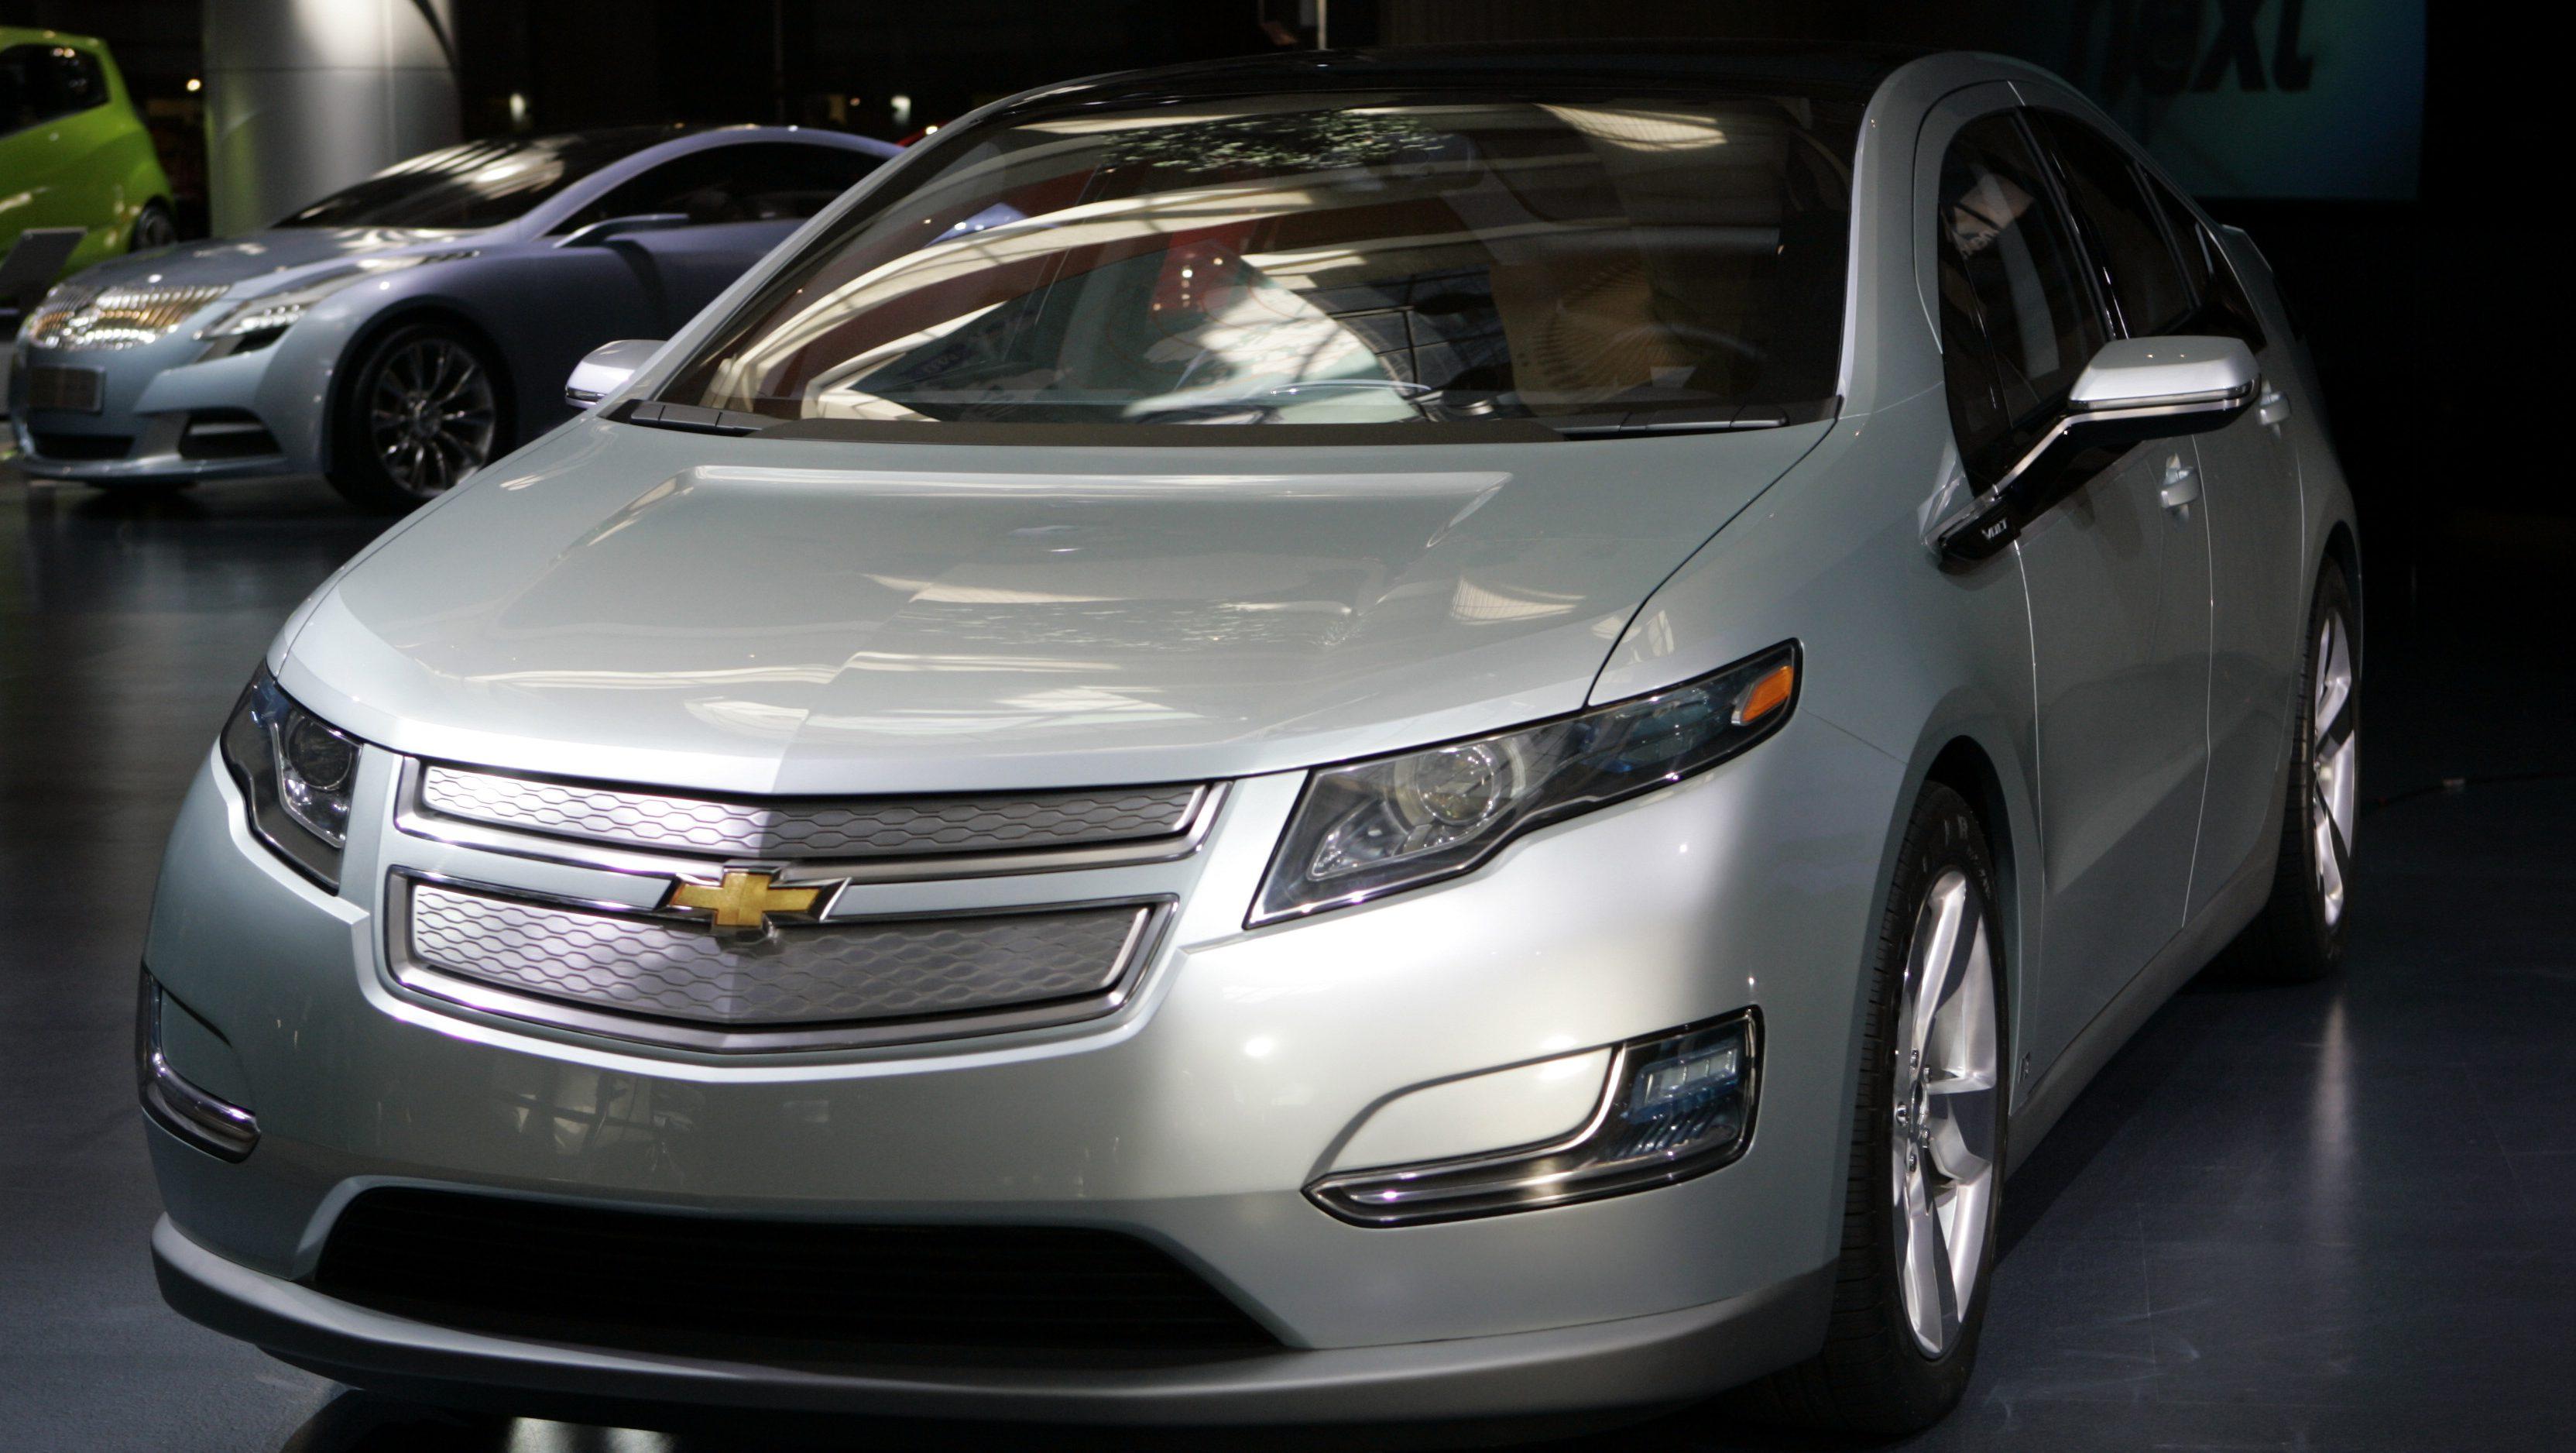 car inventory eddy volt new in chevrolet wichita lt fwd s